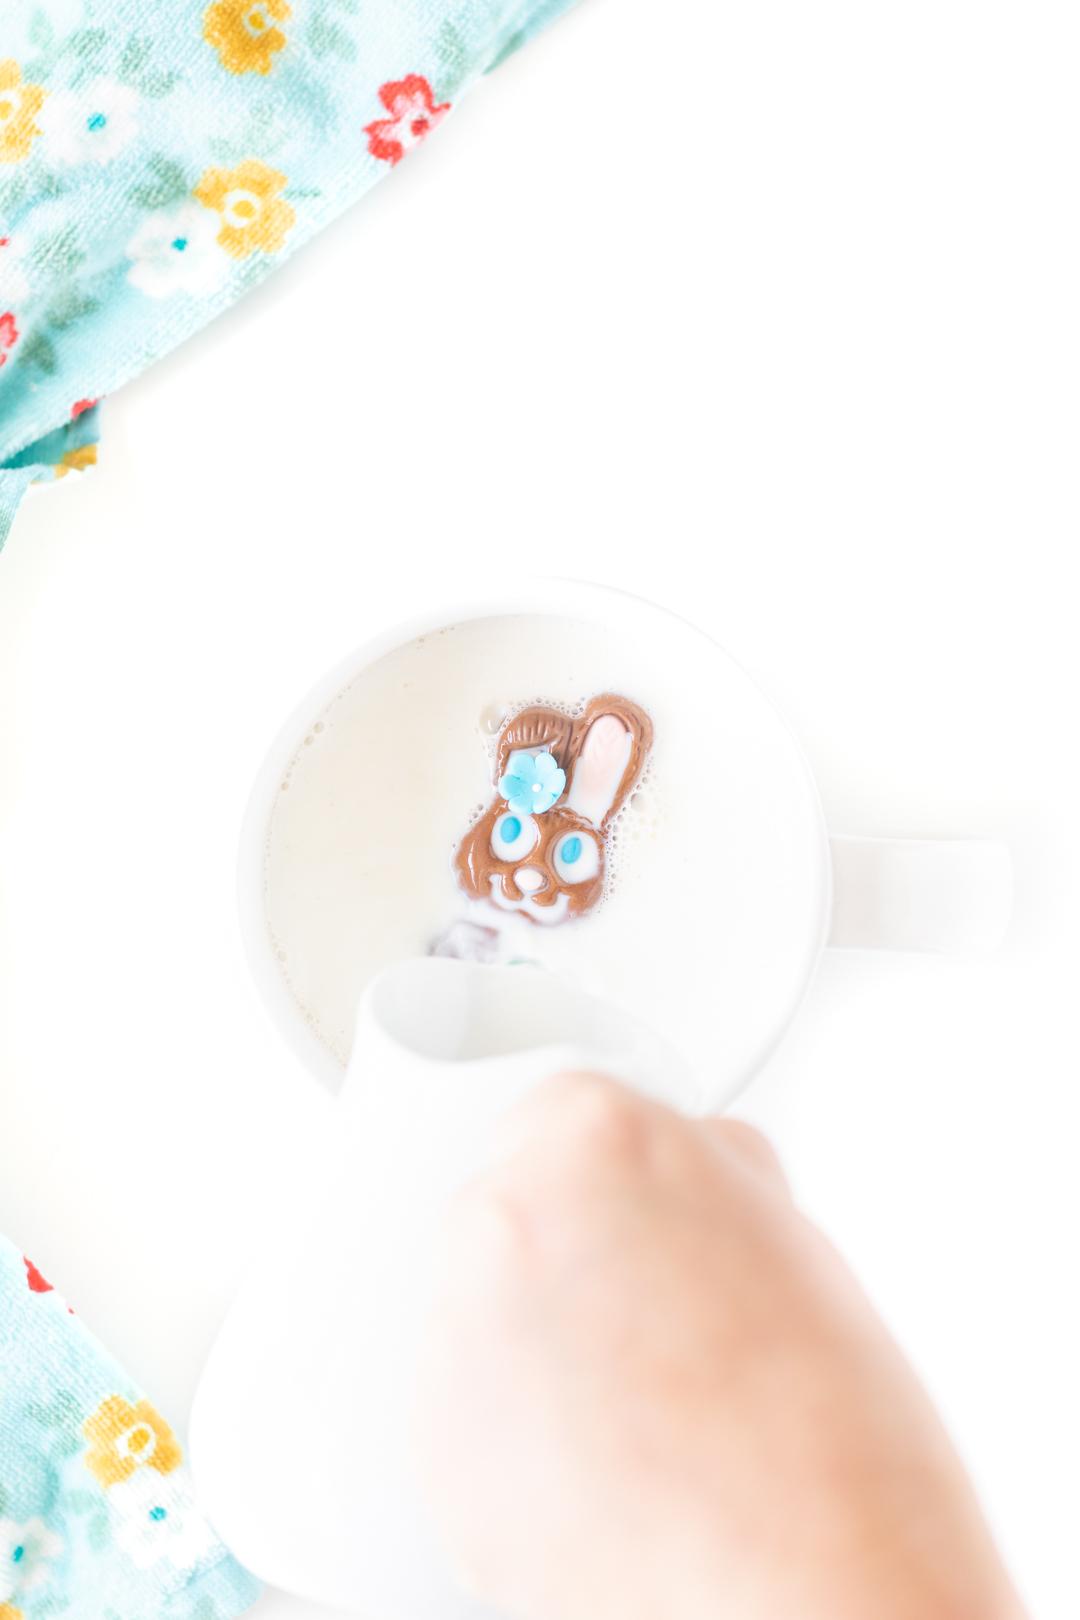 hot milk being poured into a mug